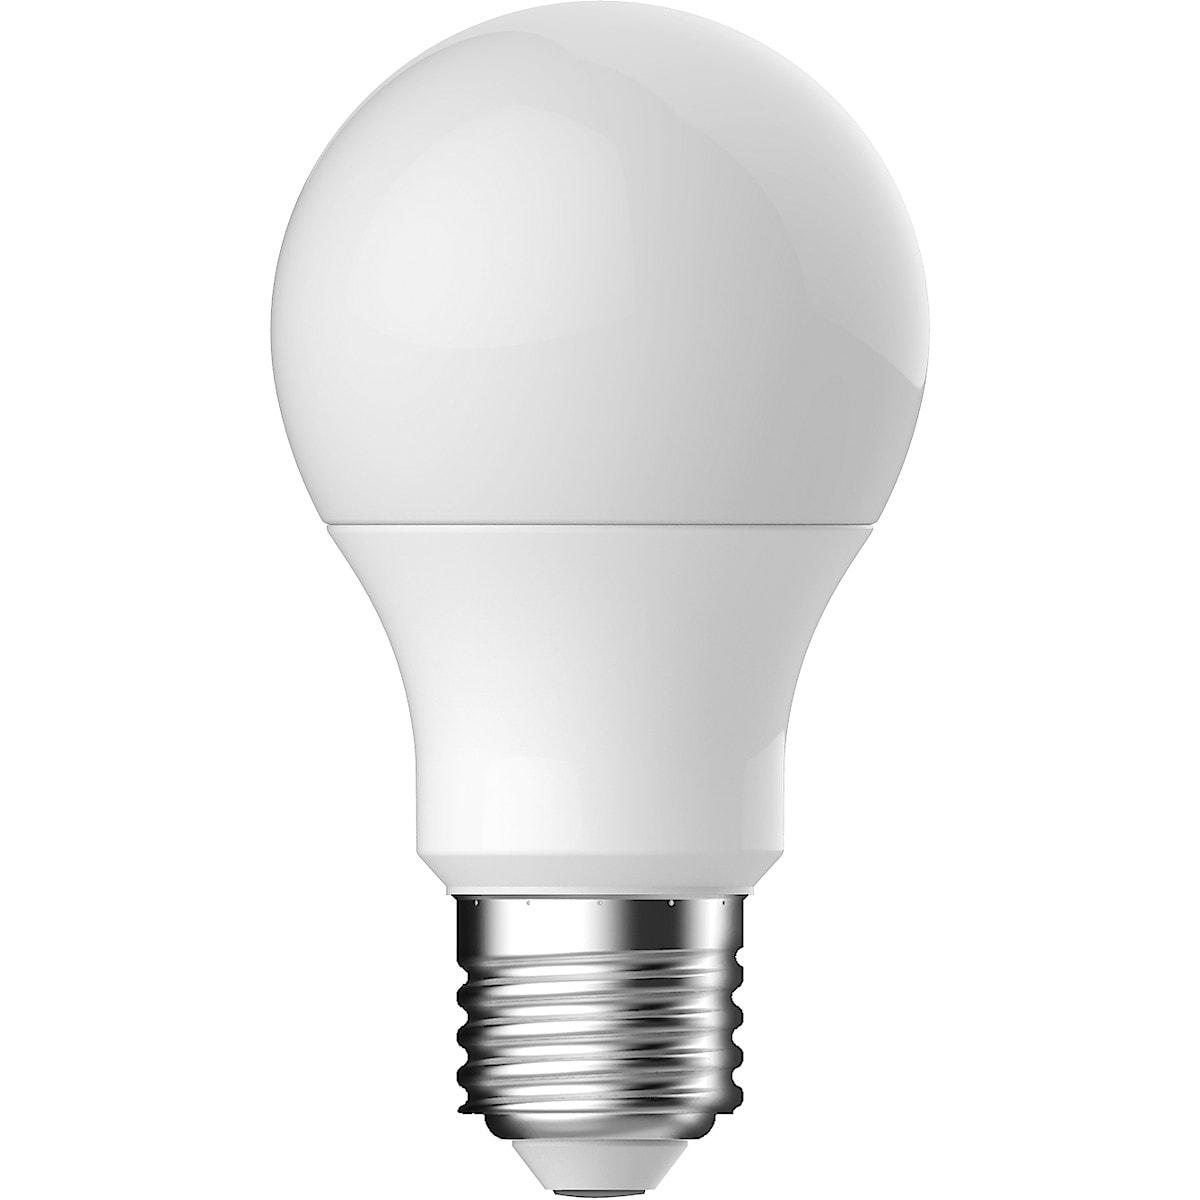 Normallampa LED kallvit E27 Clas Ohlson